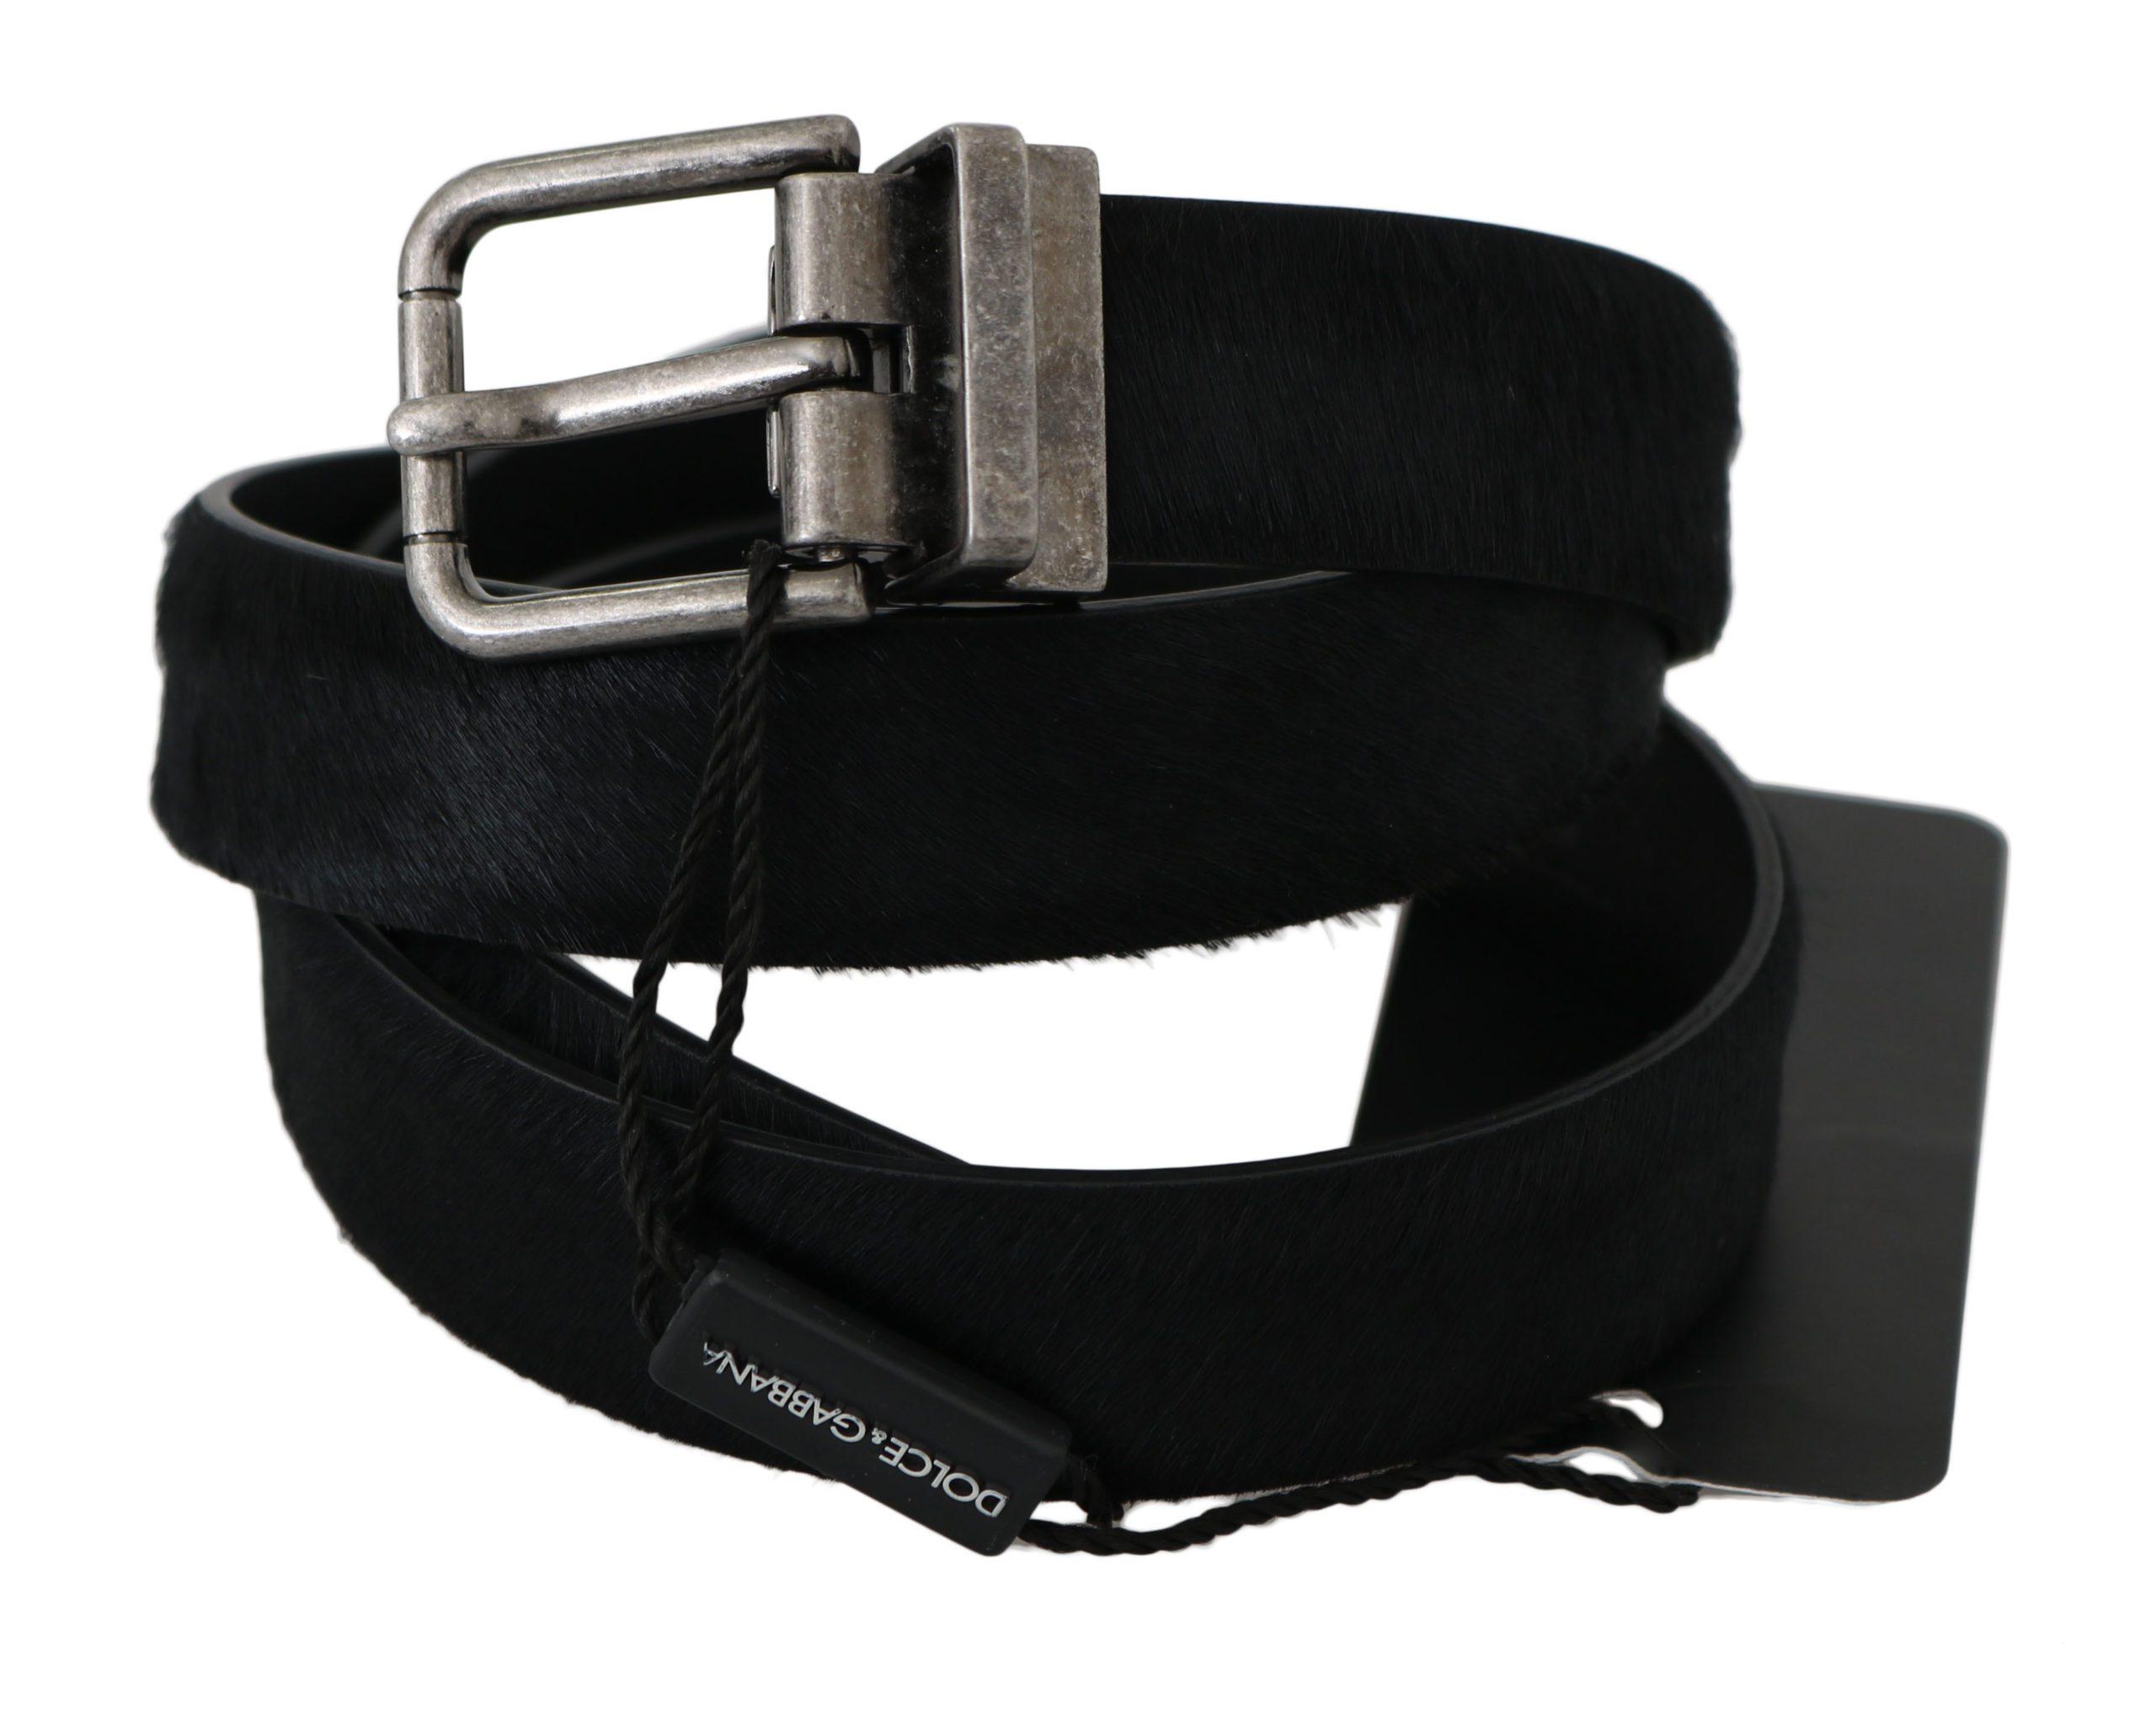 Dolce & Gabbana Men's Fur Leather Buckle Belt Black BEL60324 - 85 cm / 34 Inches